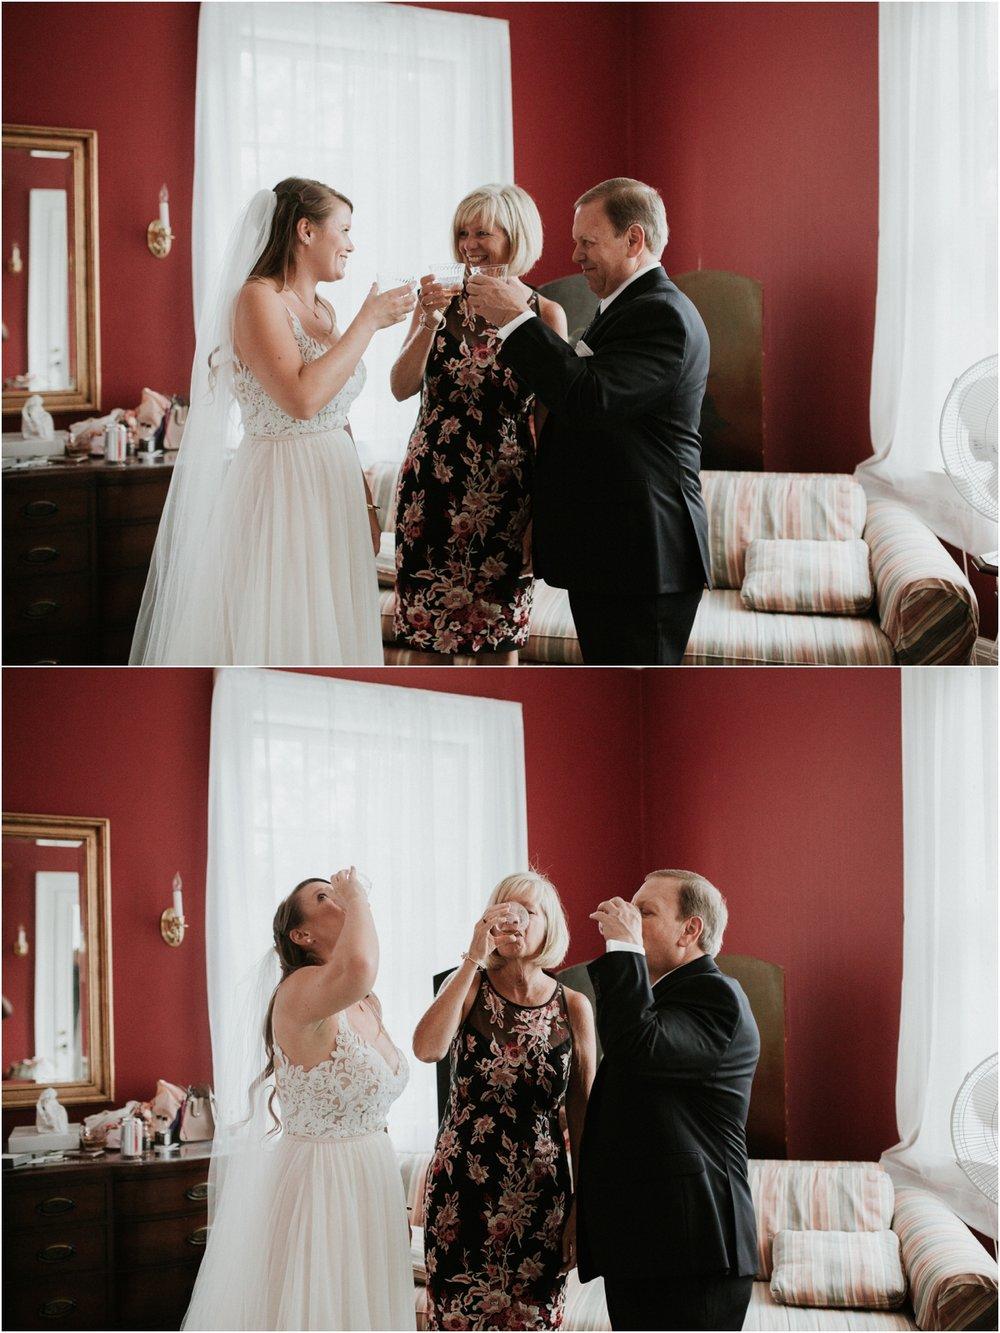 Stowe-manor-wedding-belmont-nc_0014.jpg